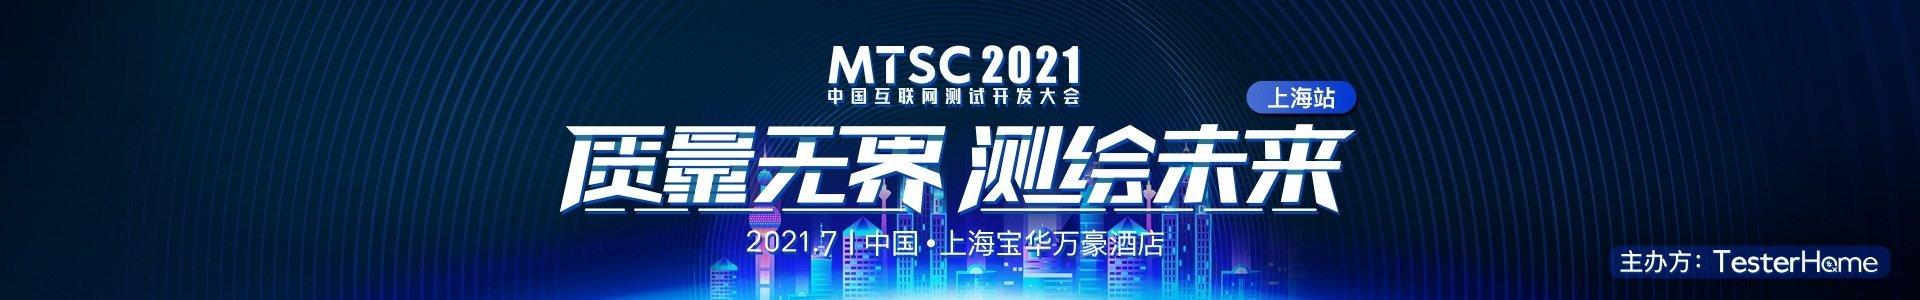 MTSC2021 中国互联网测试开发大会